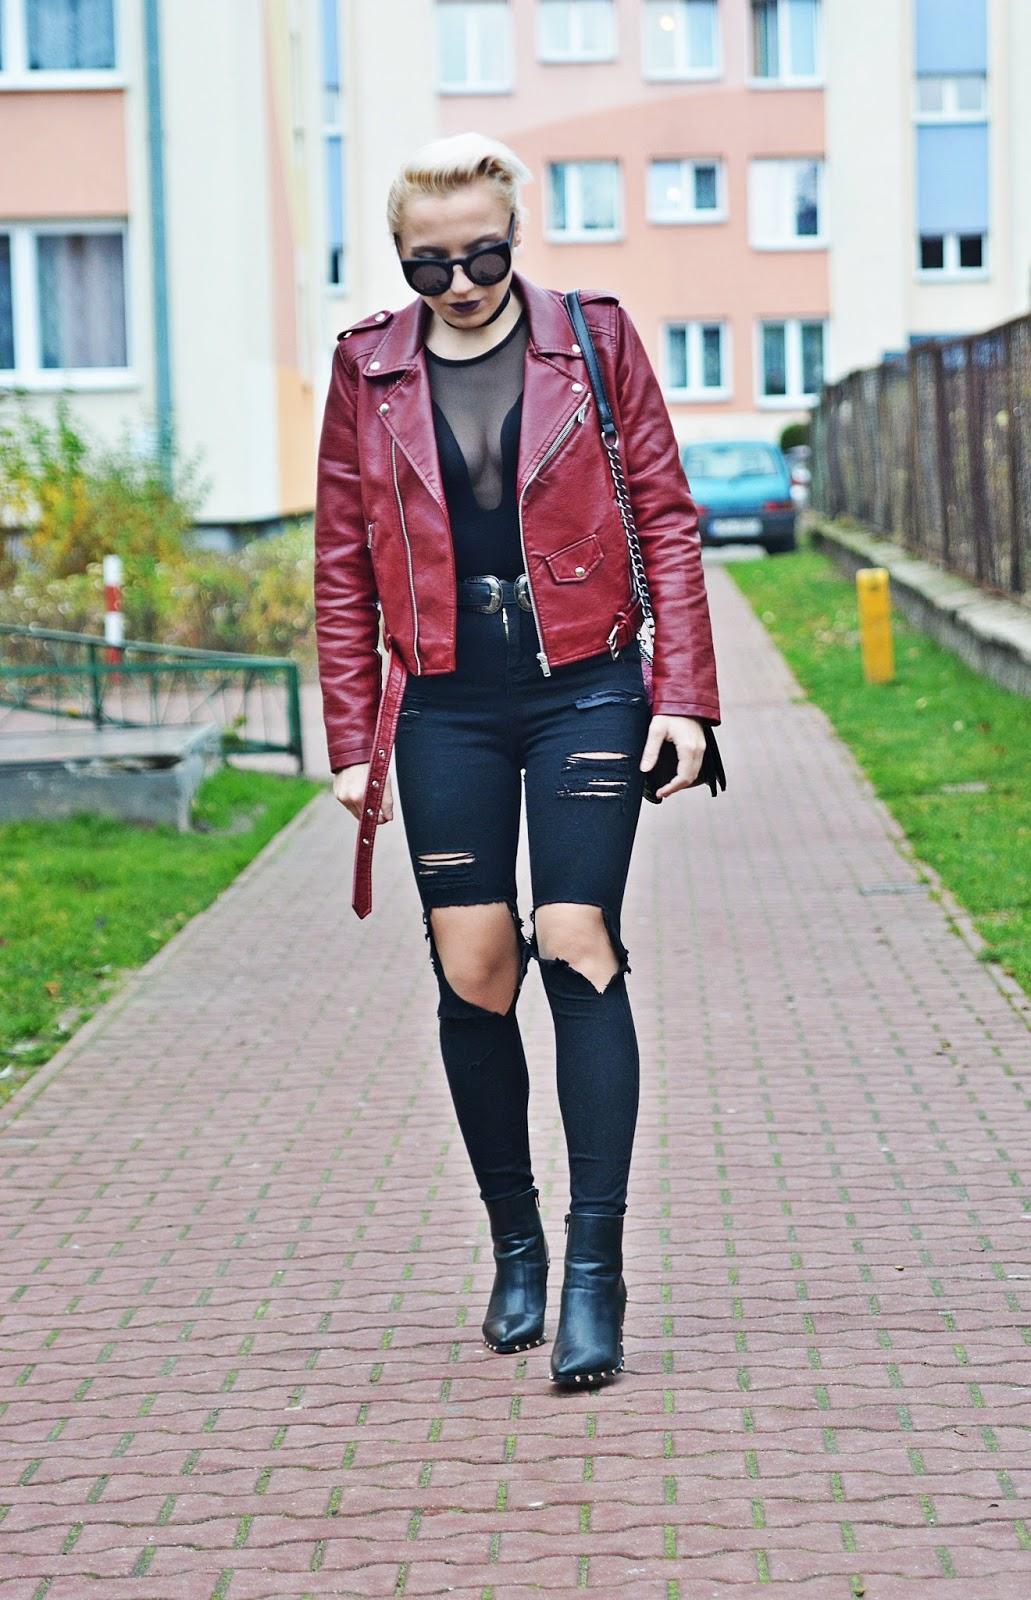 blogerka_modowa_karyn_blog_modowy_pulawy